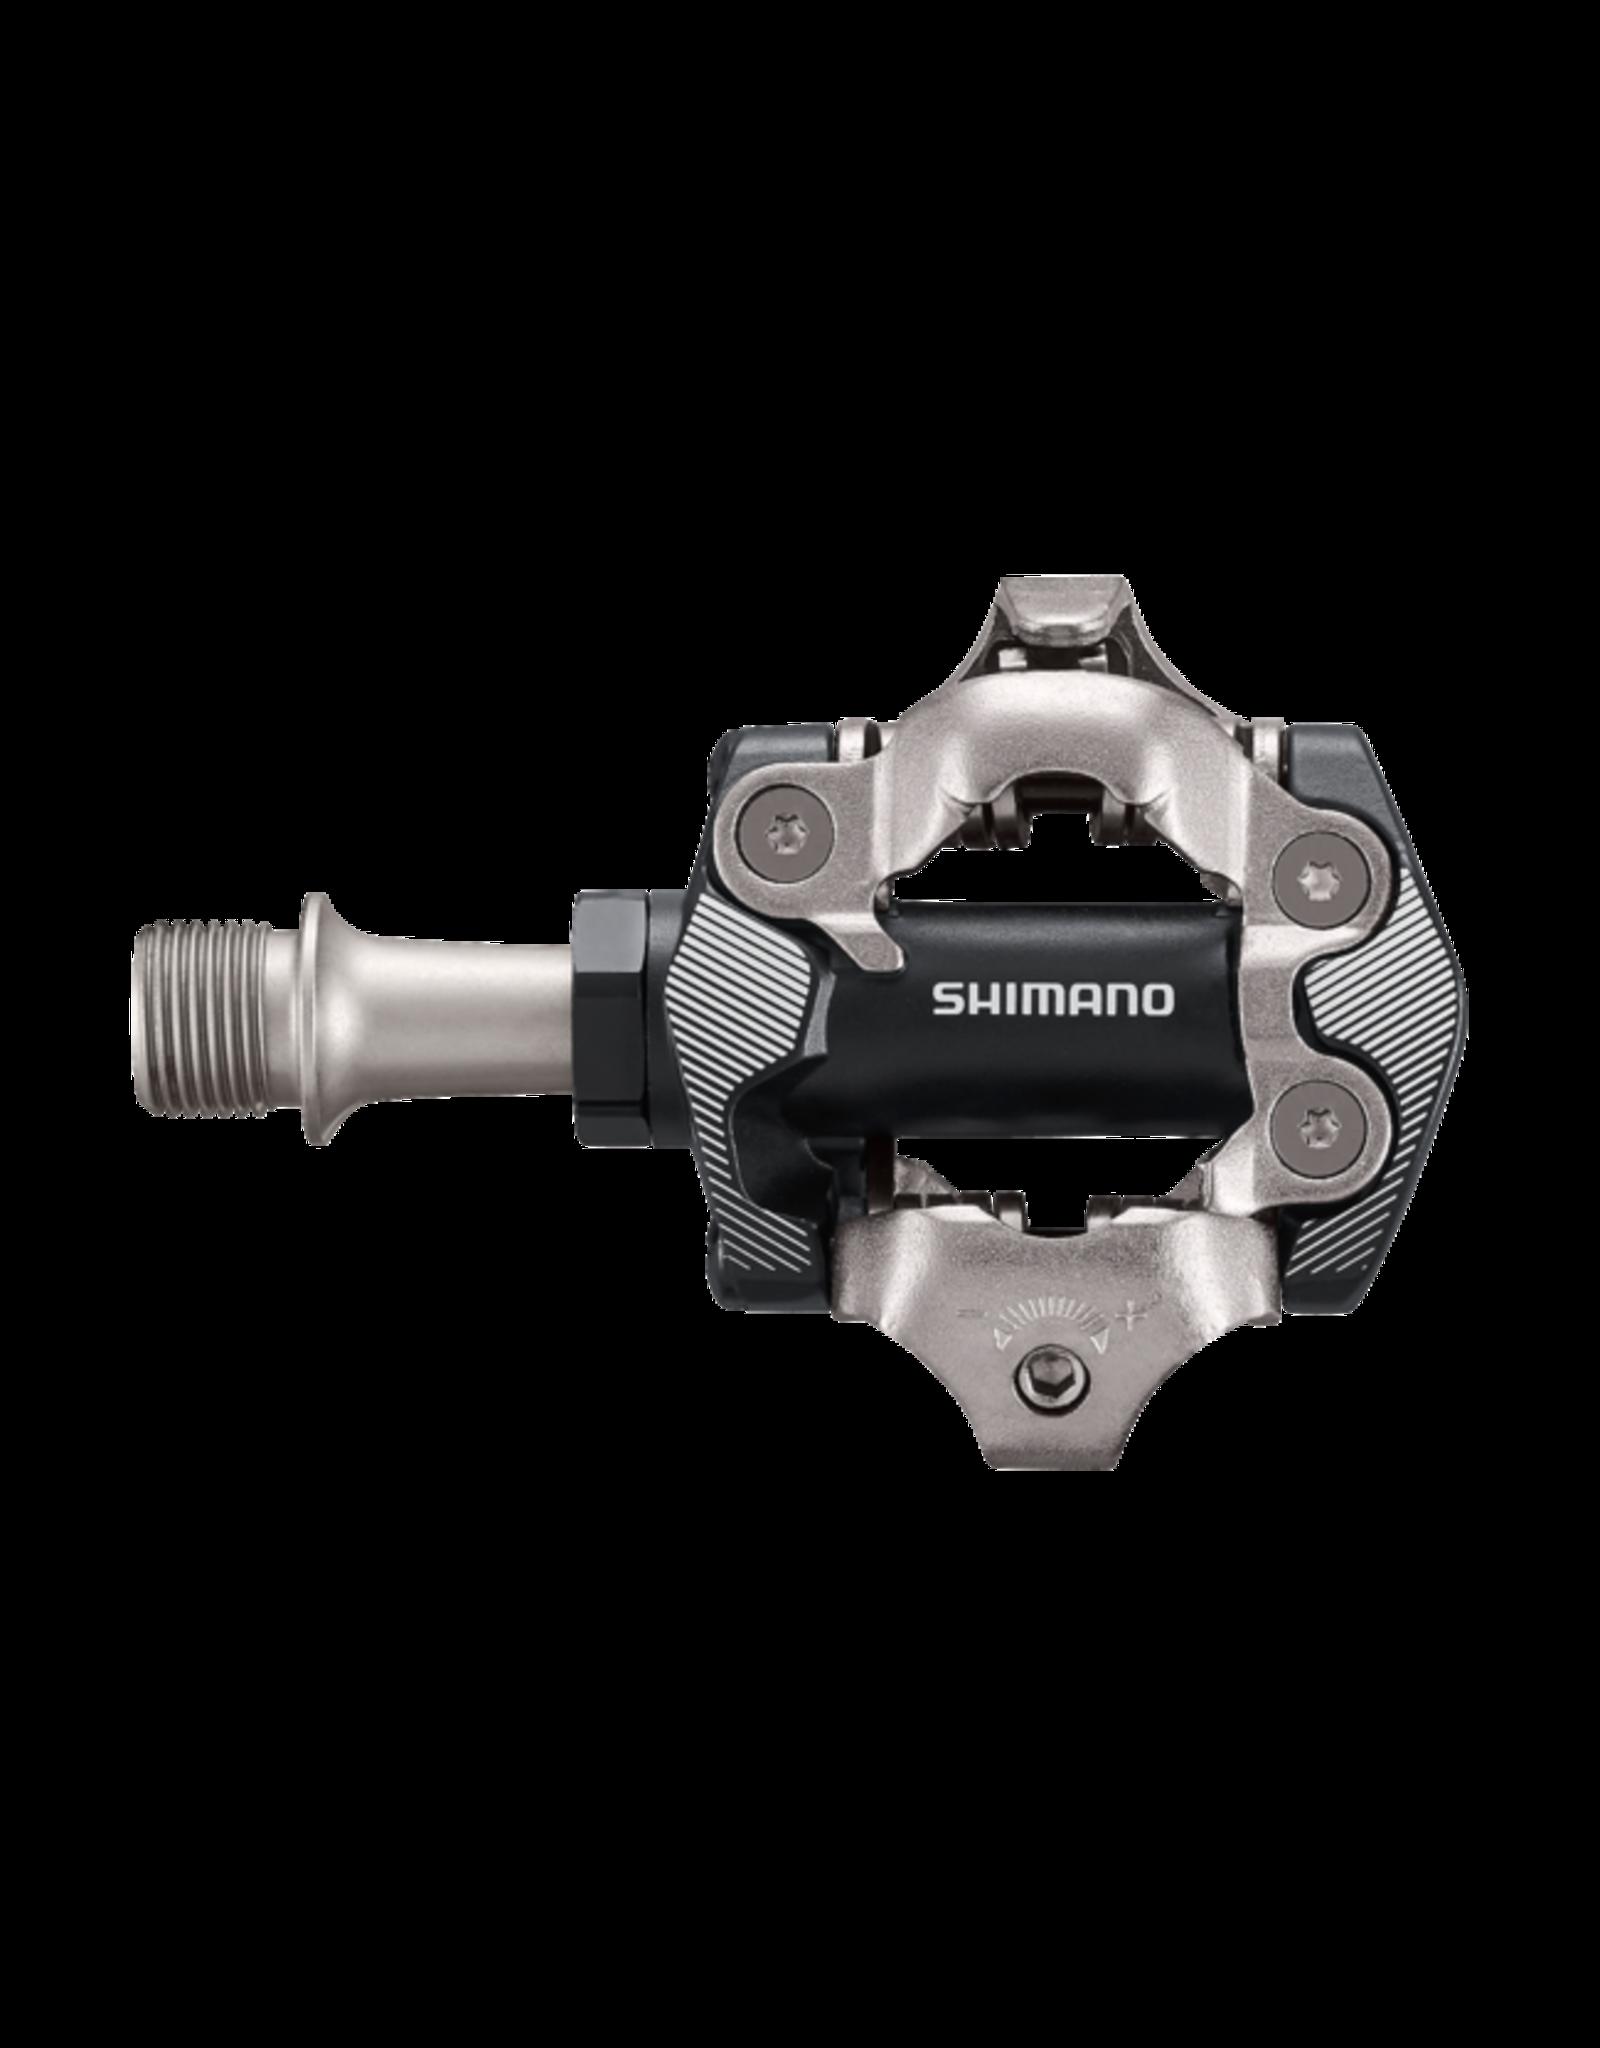 Shimano PEDAL, PD-M8100, DEORE XT, SPD PEDAL, W/CLEAT(SM-SH51)